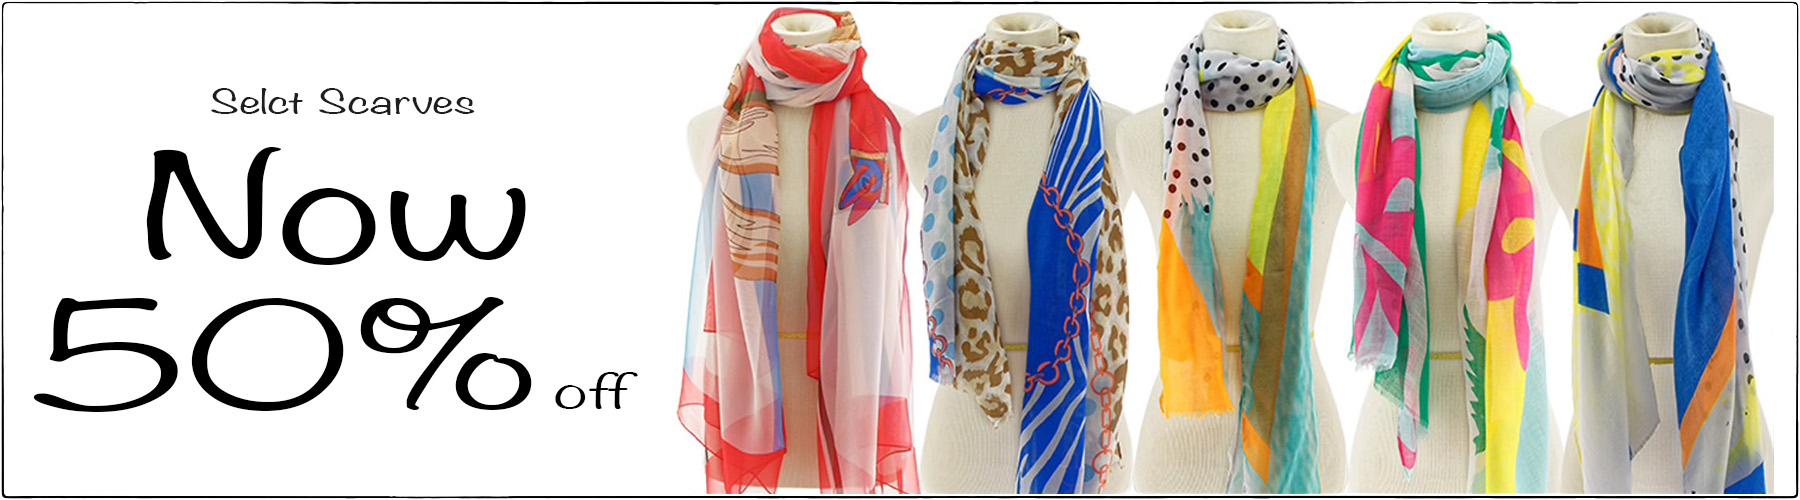 scarvessale.jpg